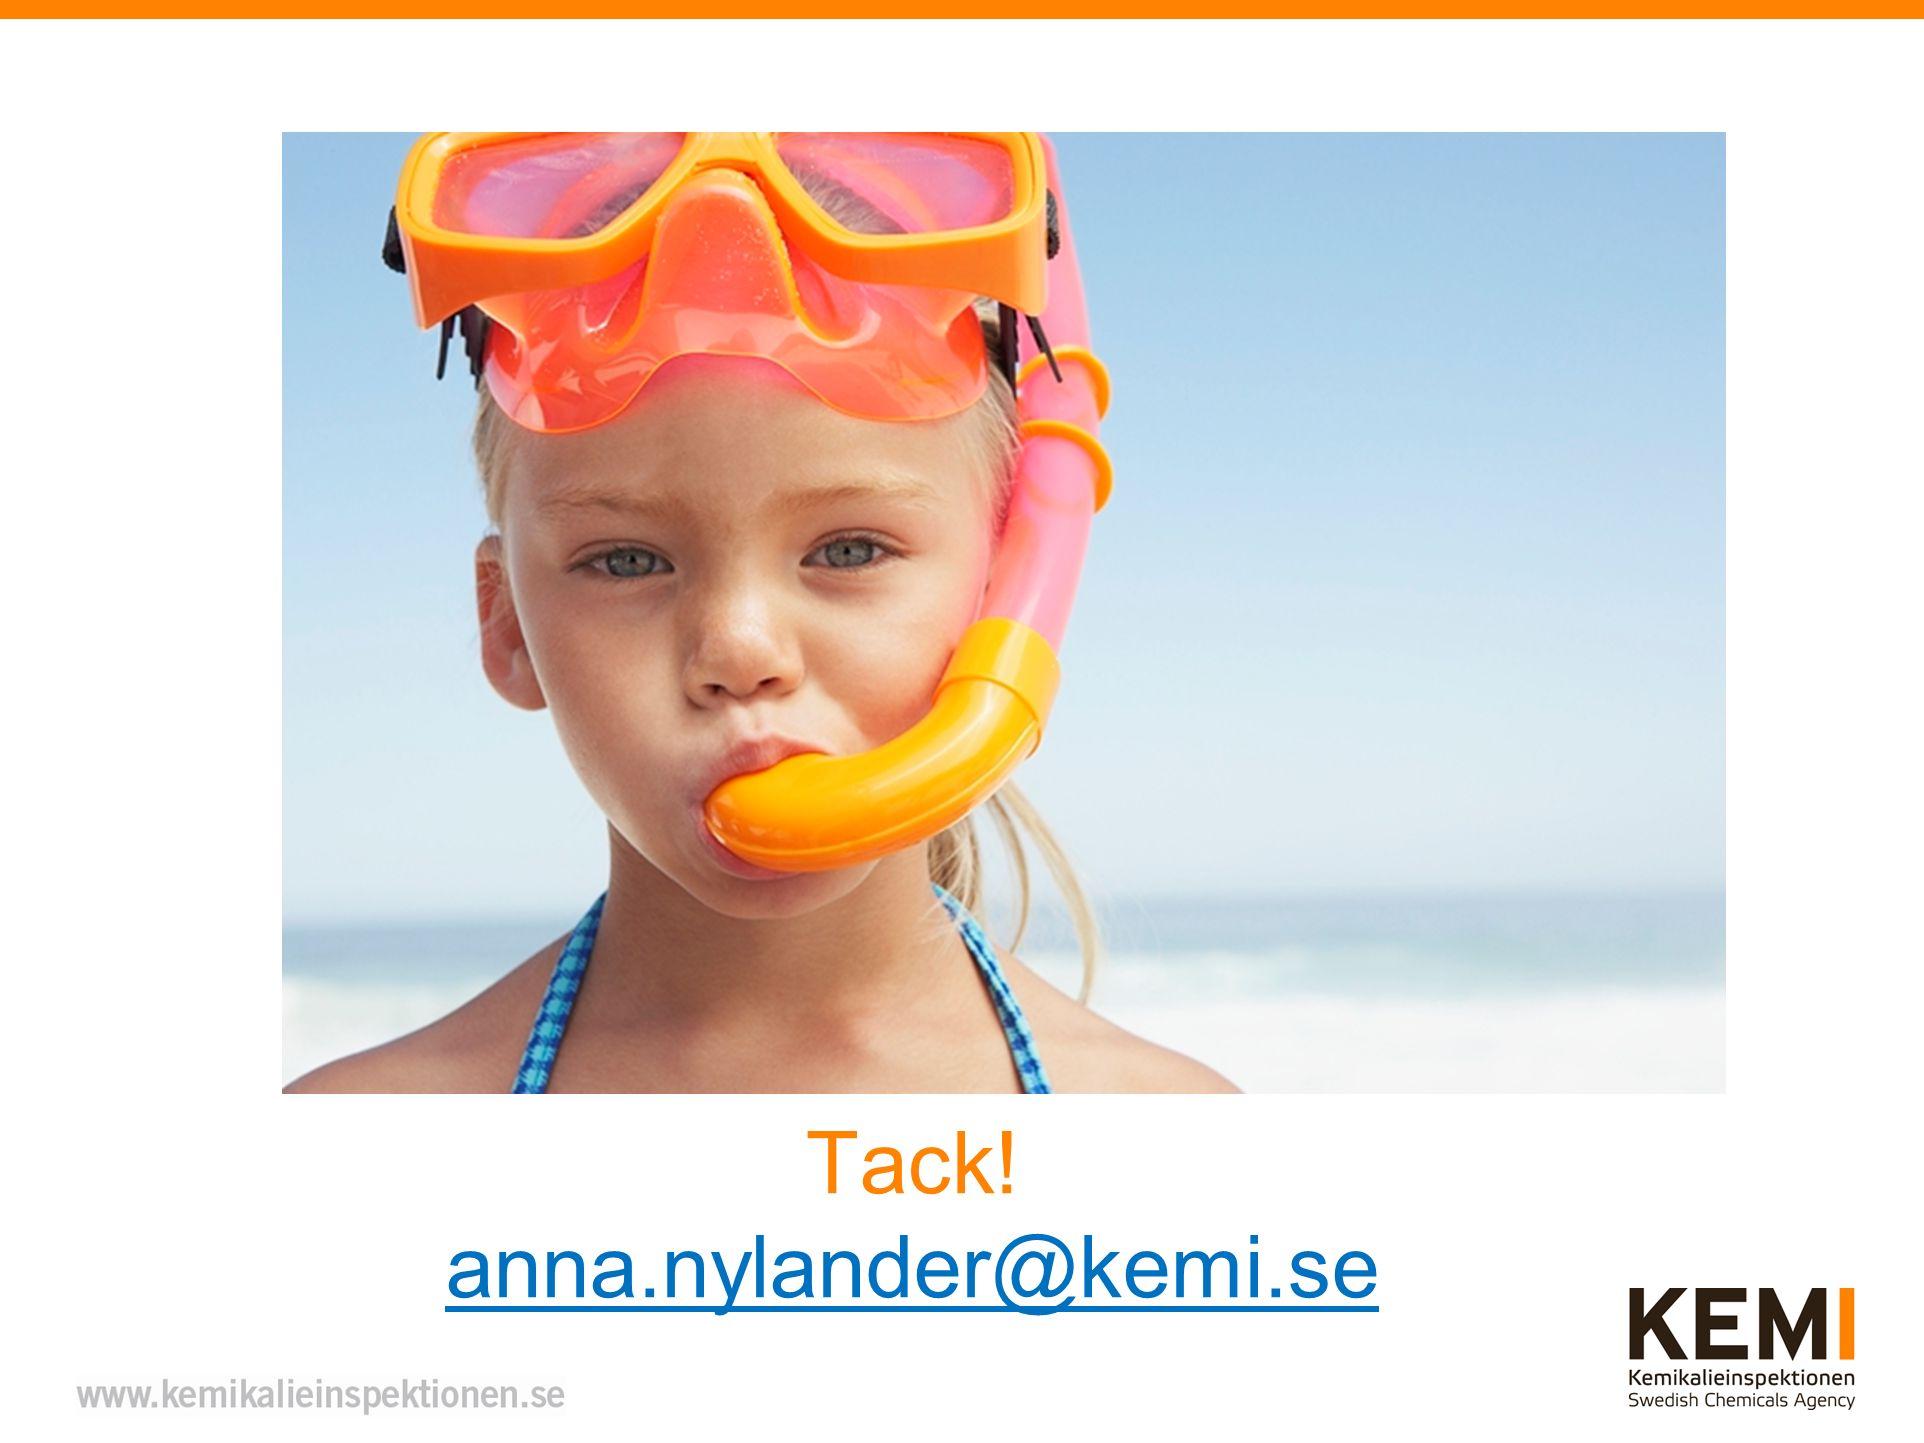 Tack! anna.nylander@kemi.se